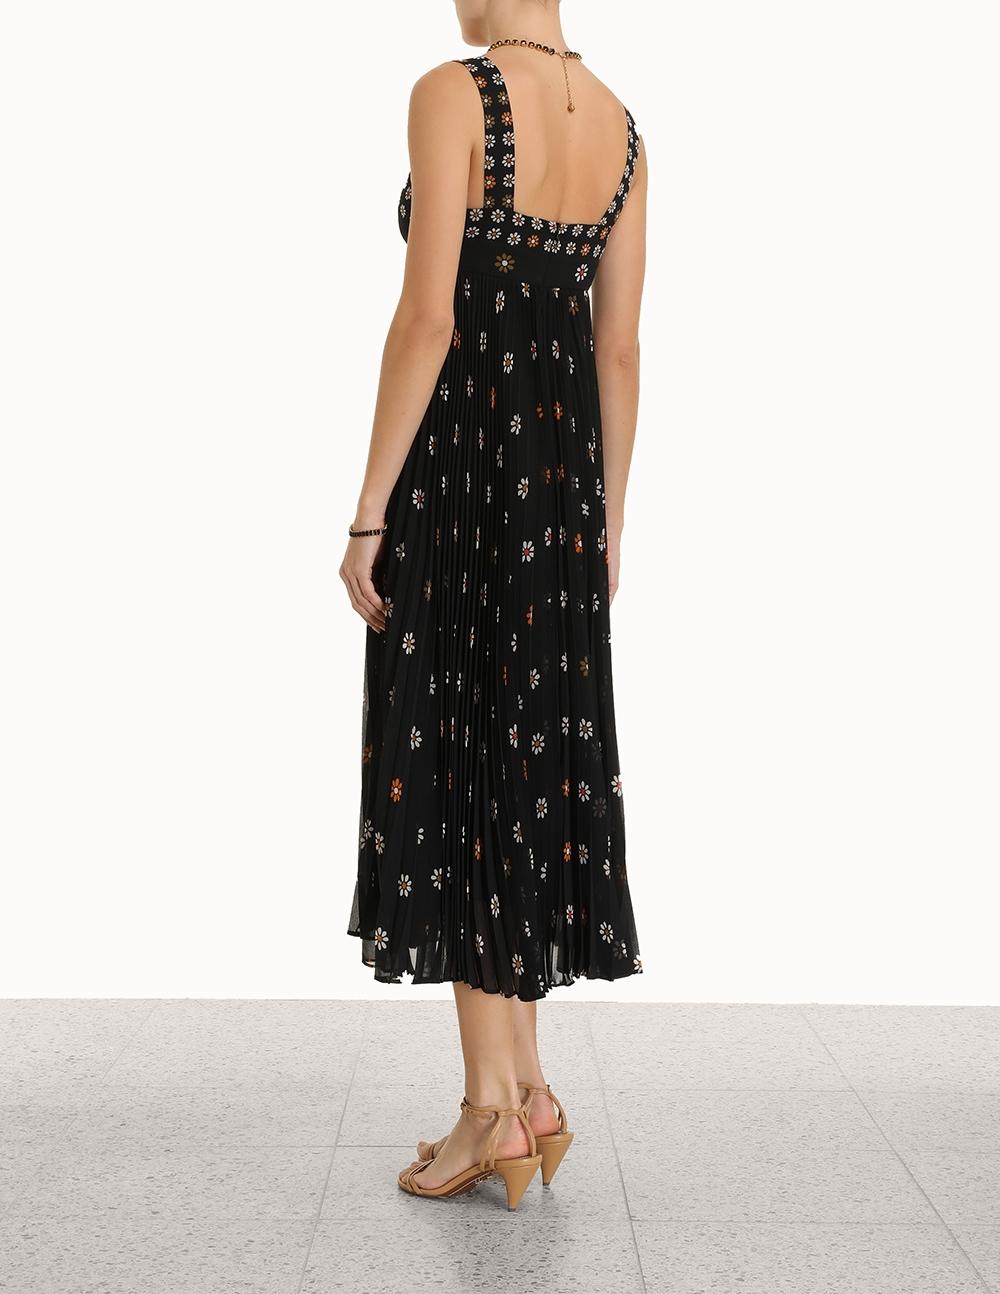 Sunray Day Dress